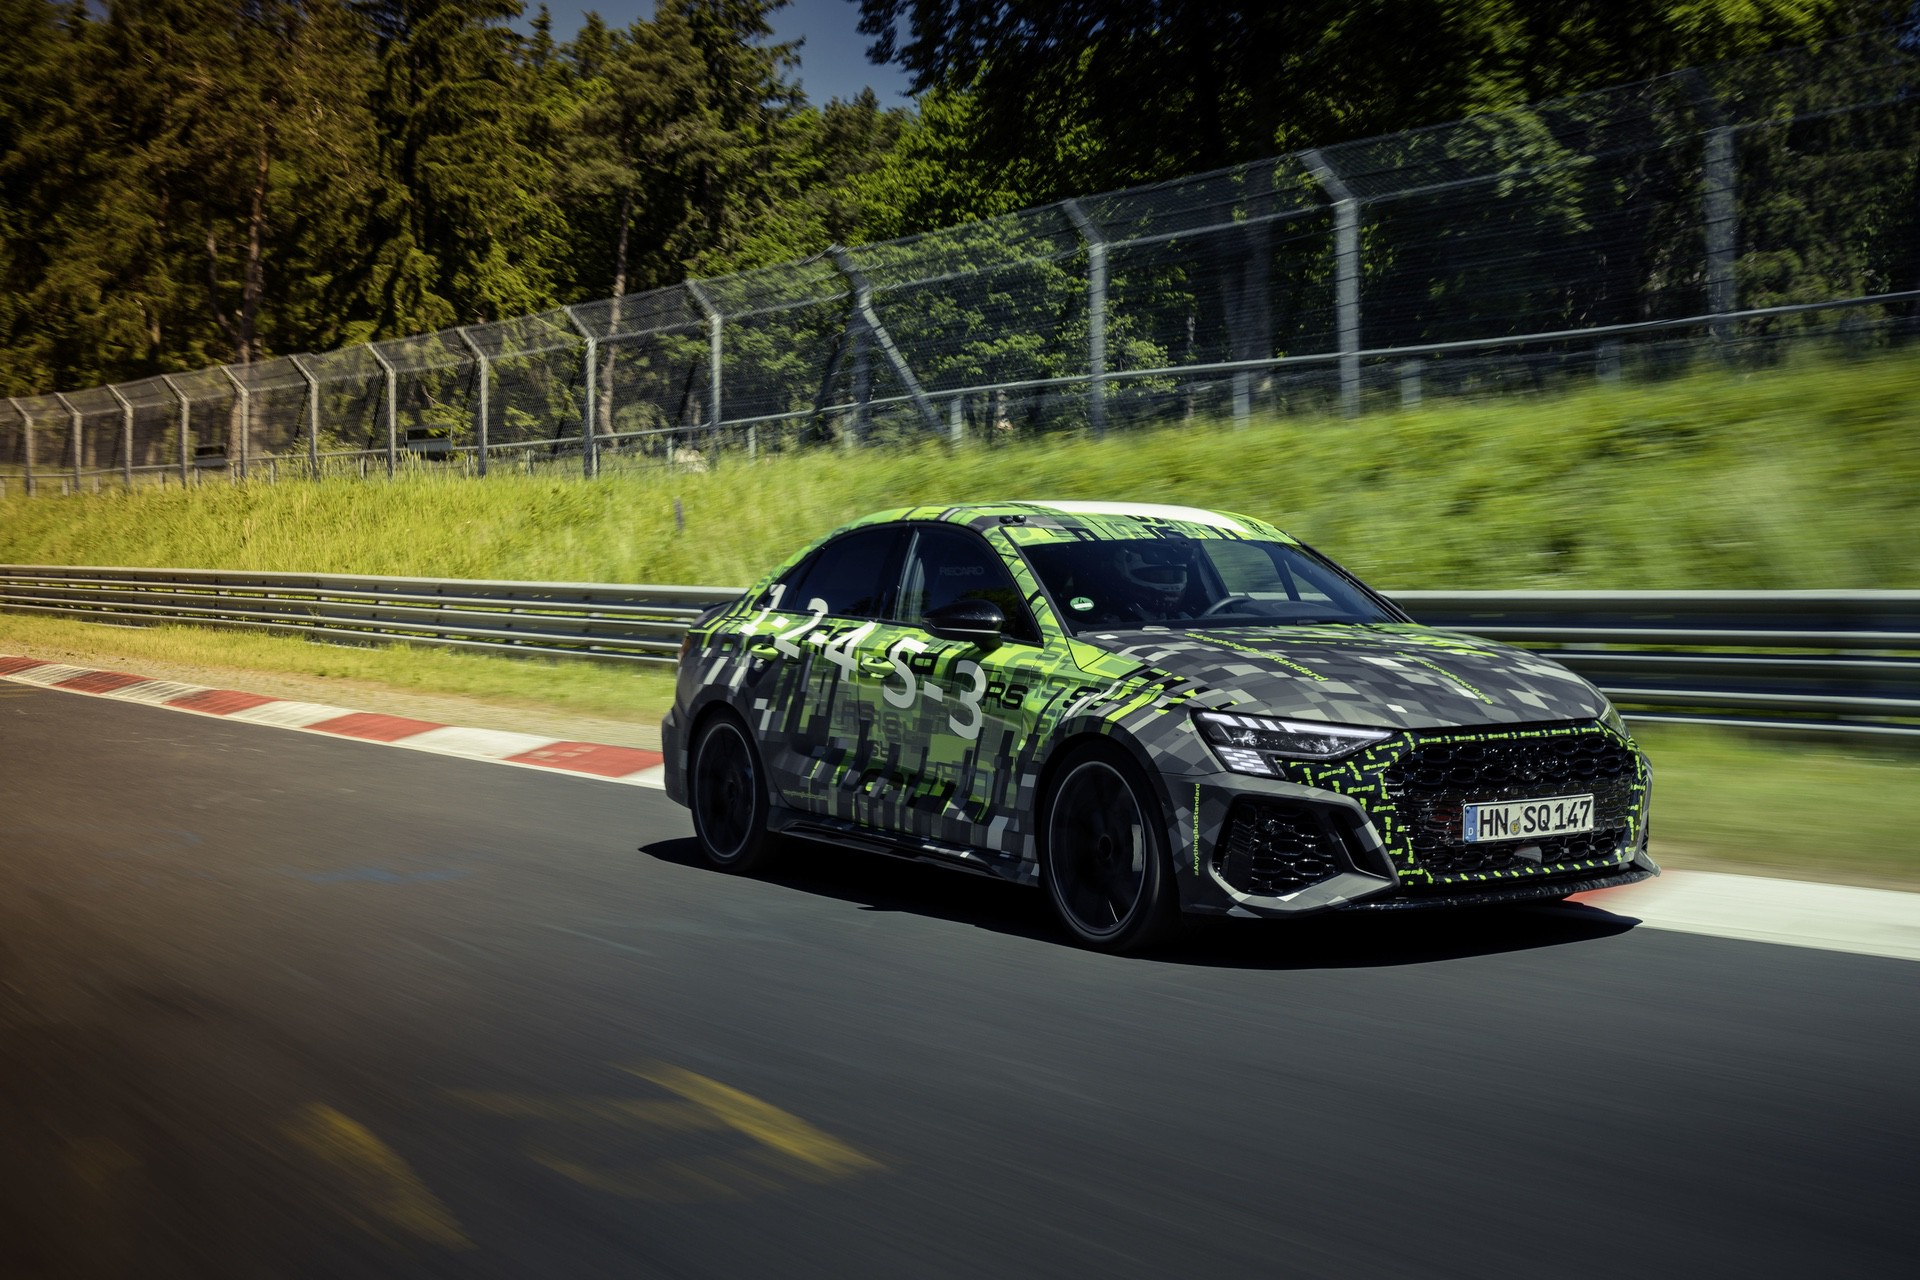 Audi_RS3_Sedan_Nurburgring_lap_record-0004